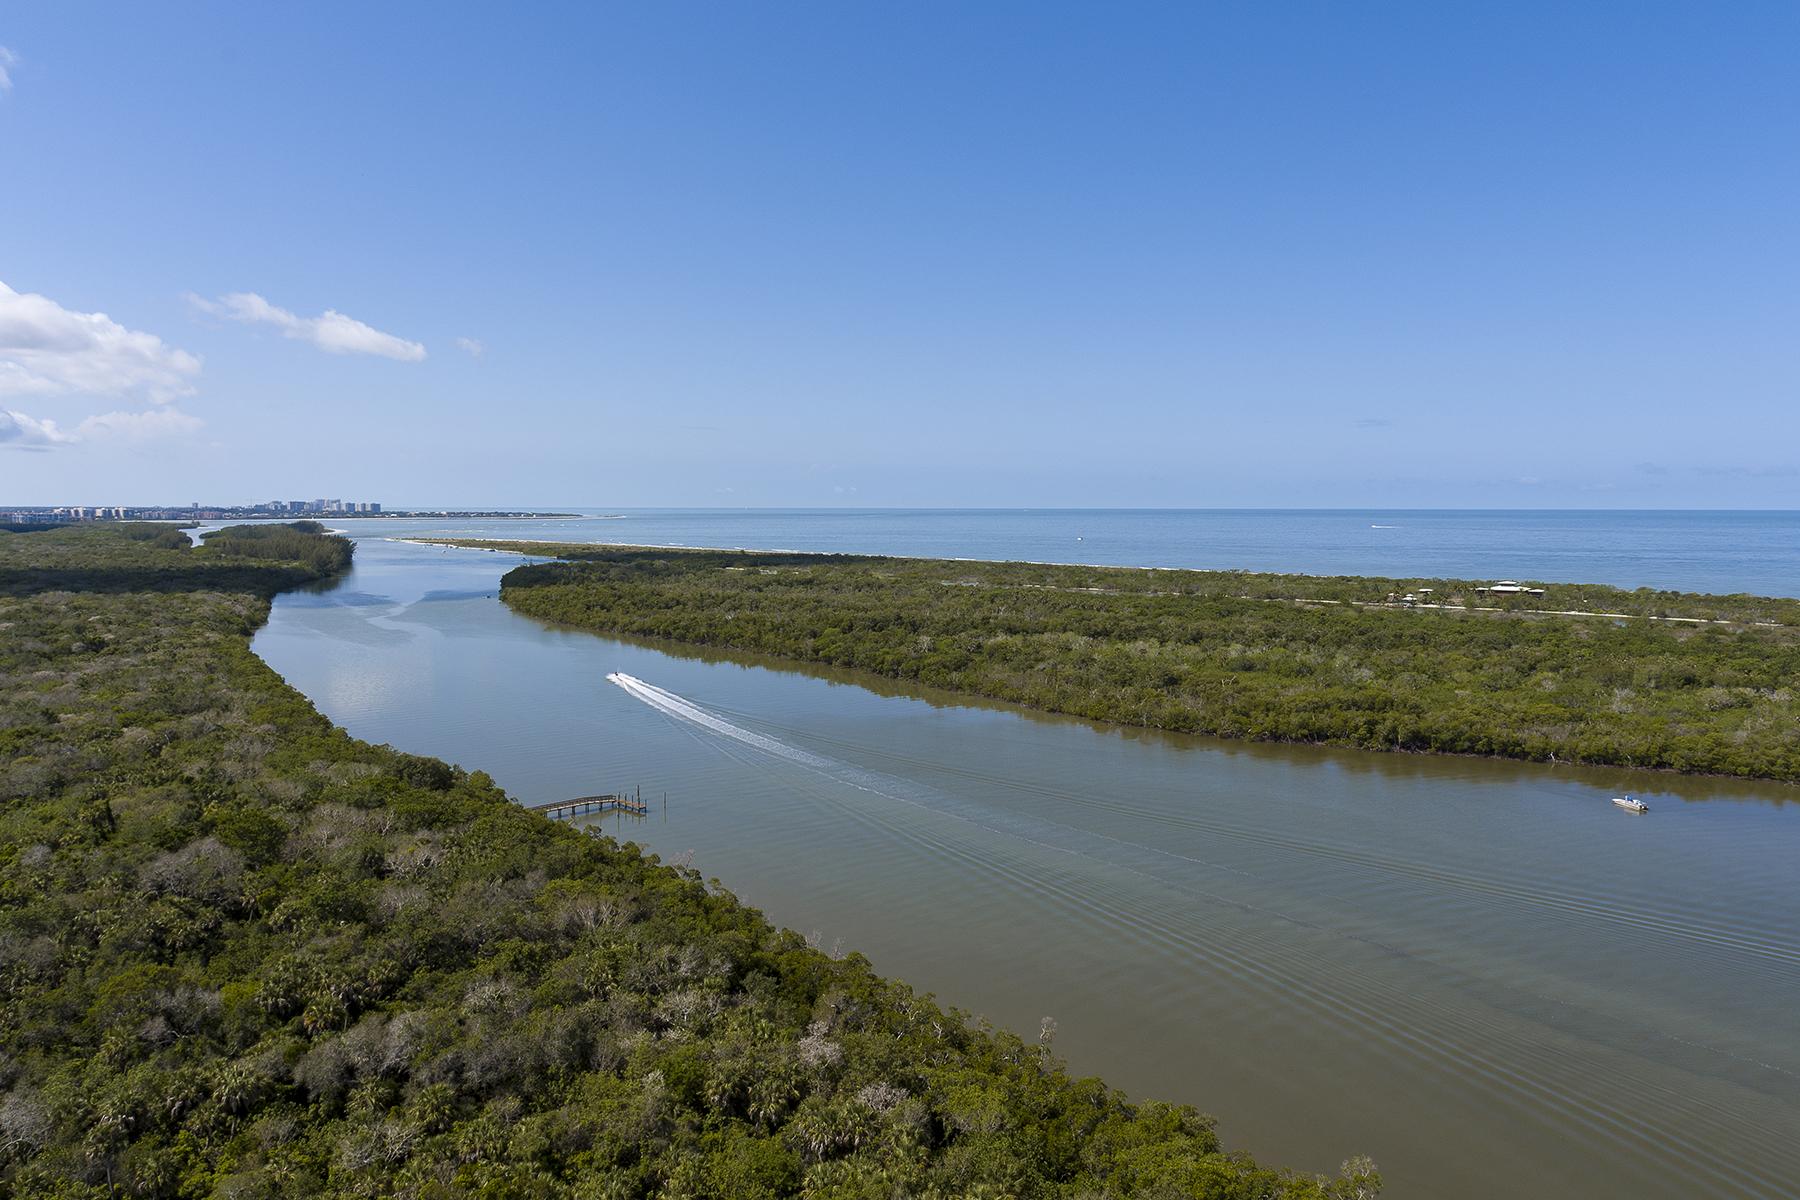 Land for Sale at KEEWAYDIN ISLAND 12117 Cannon Island, Naples, Florida 34102 United States